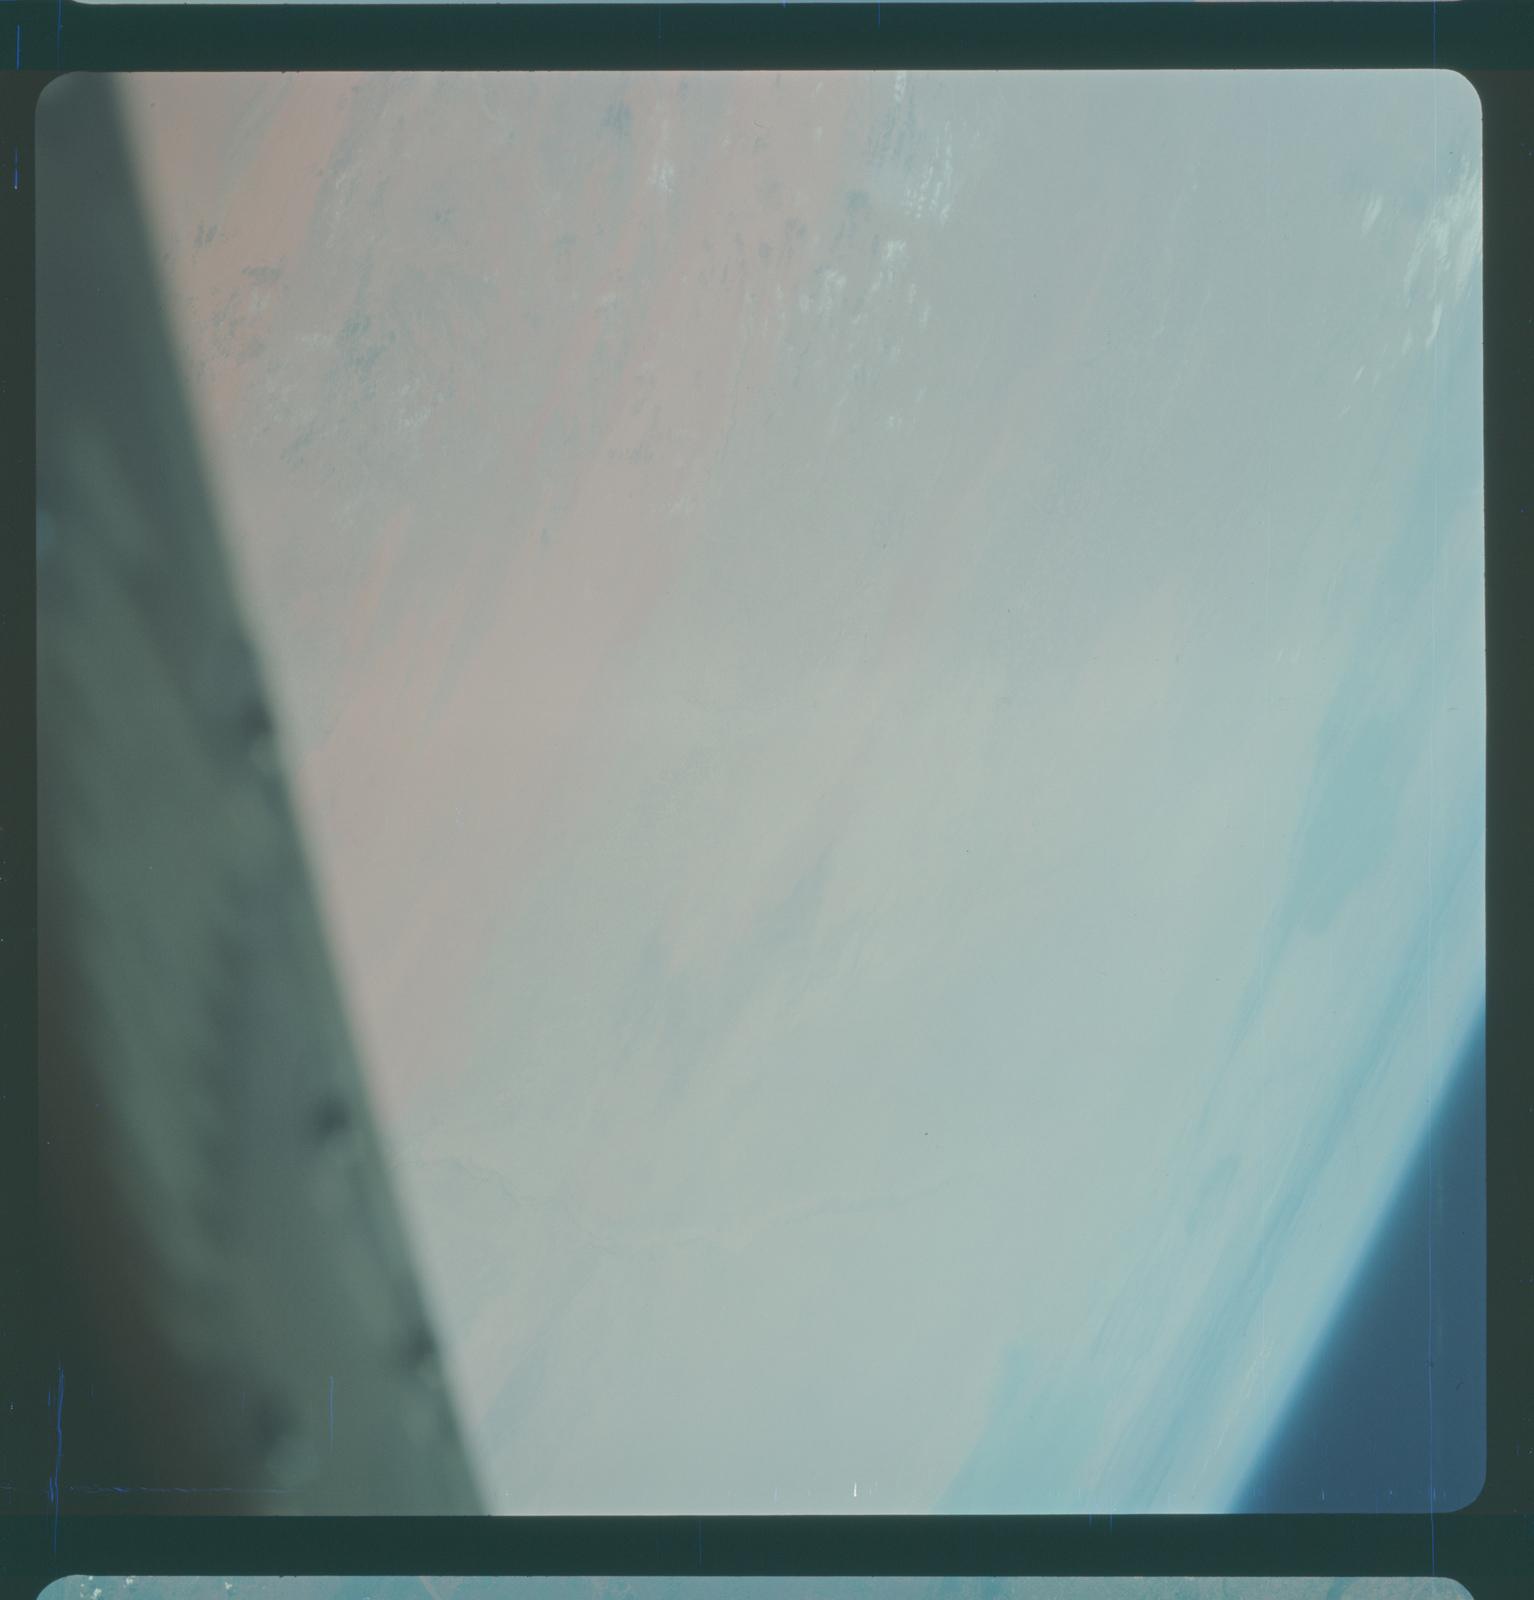 Gemini IV Mission Image -  Saudi Arabia and Iraq